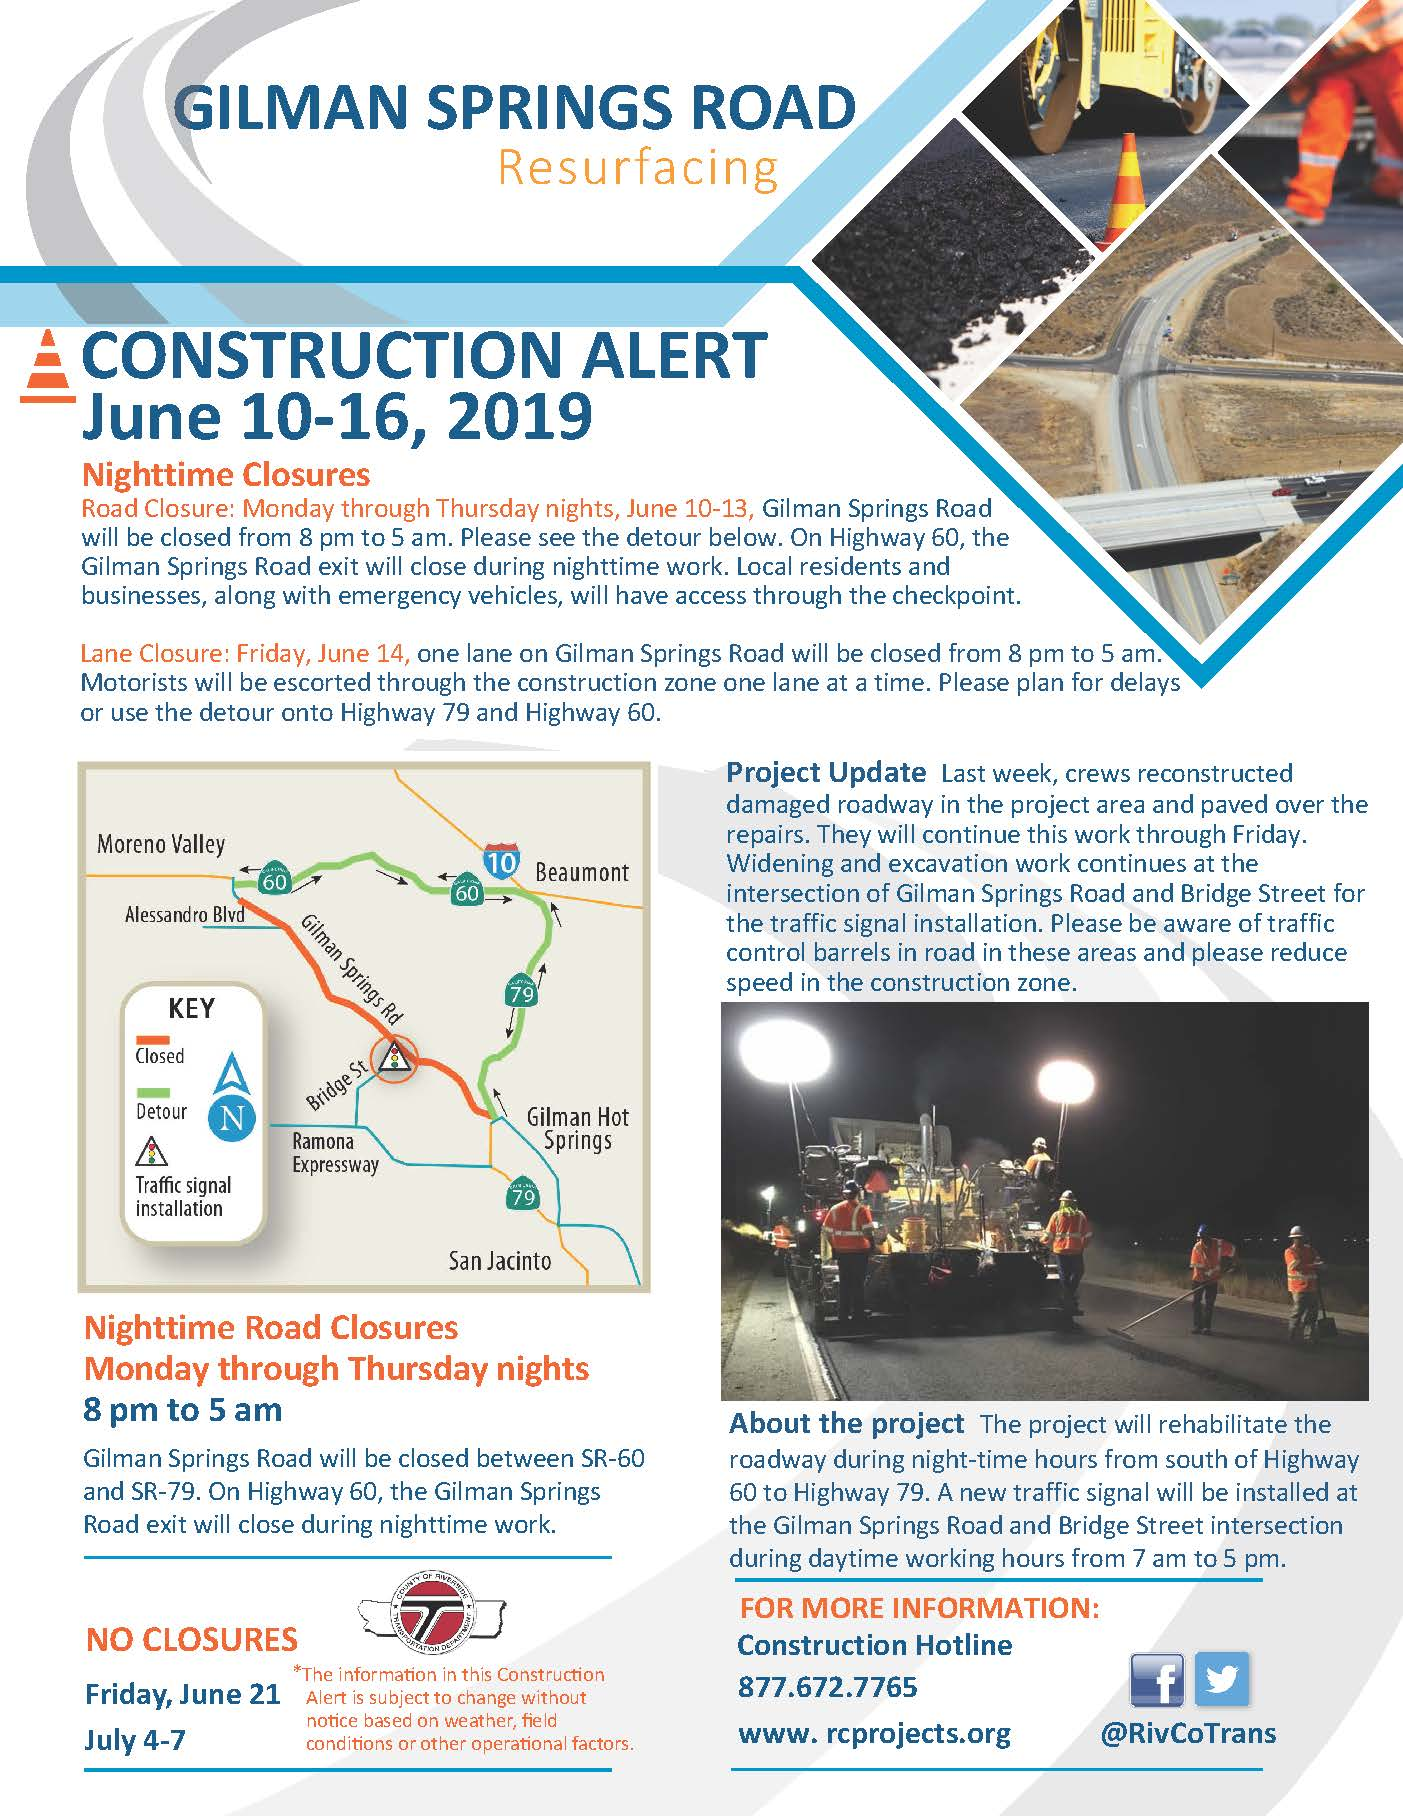 Construction Alert June 10-13, 2019: Gilman Springs Road Resurfacing